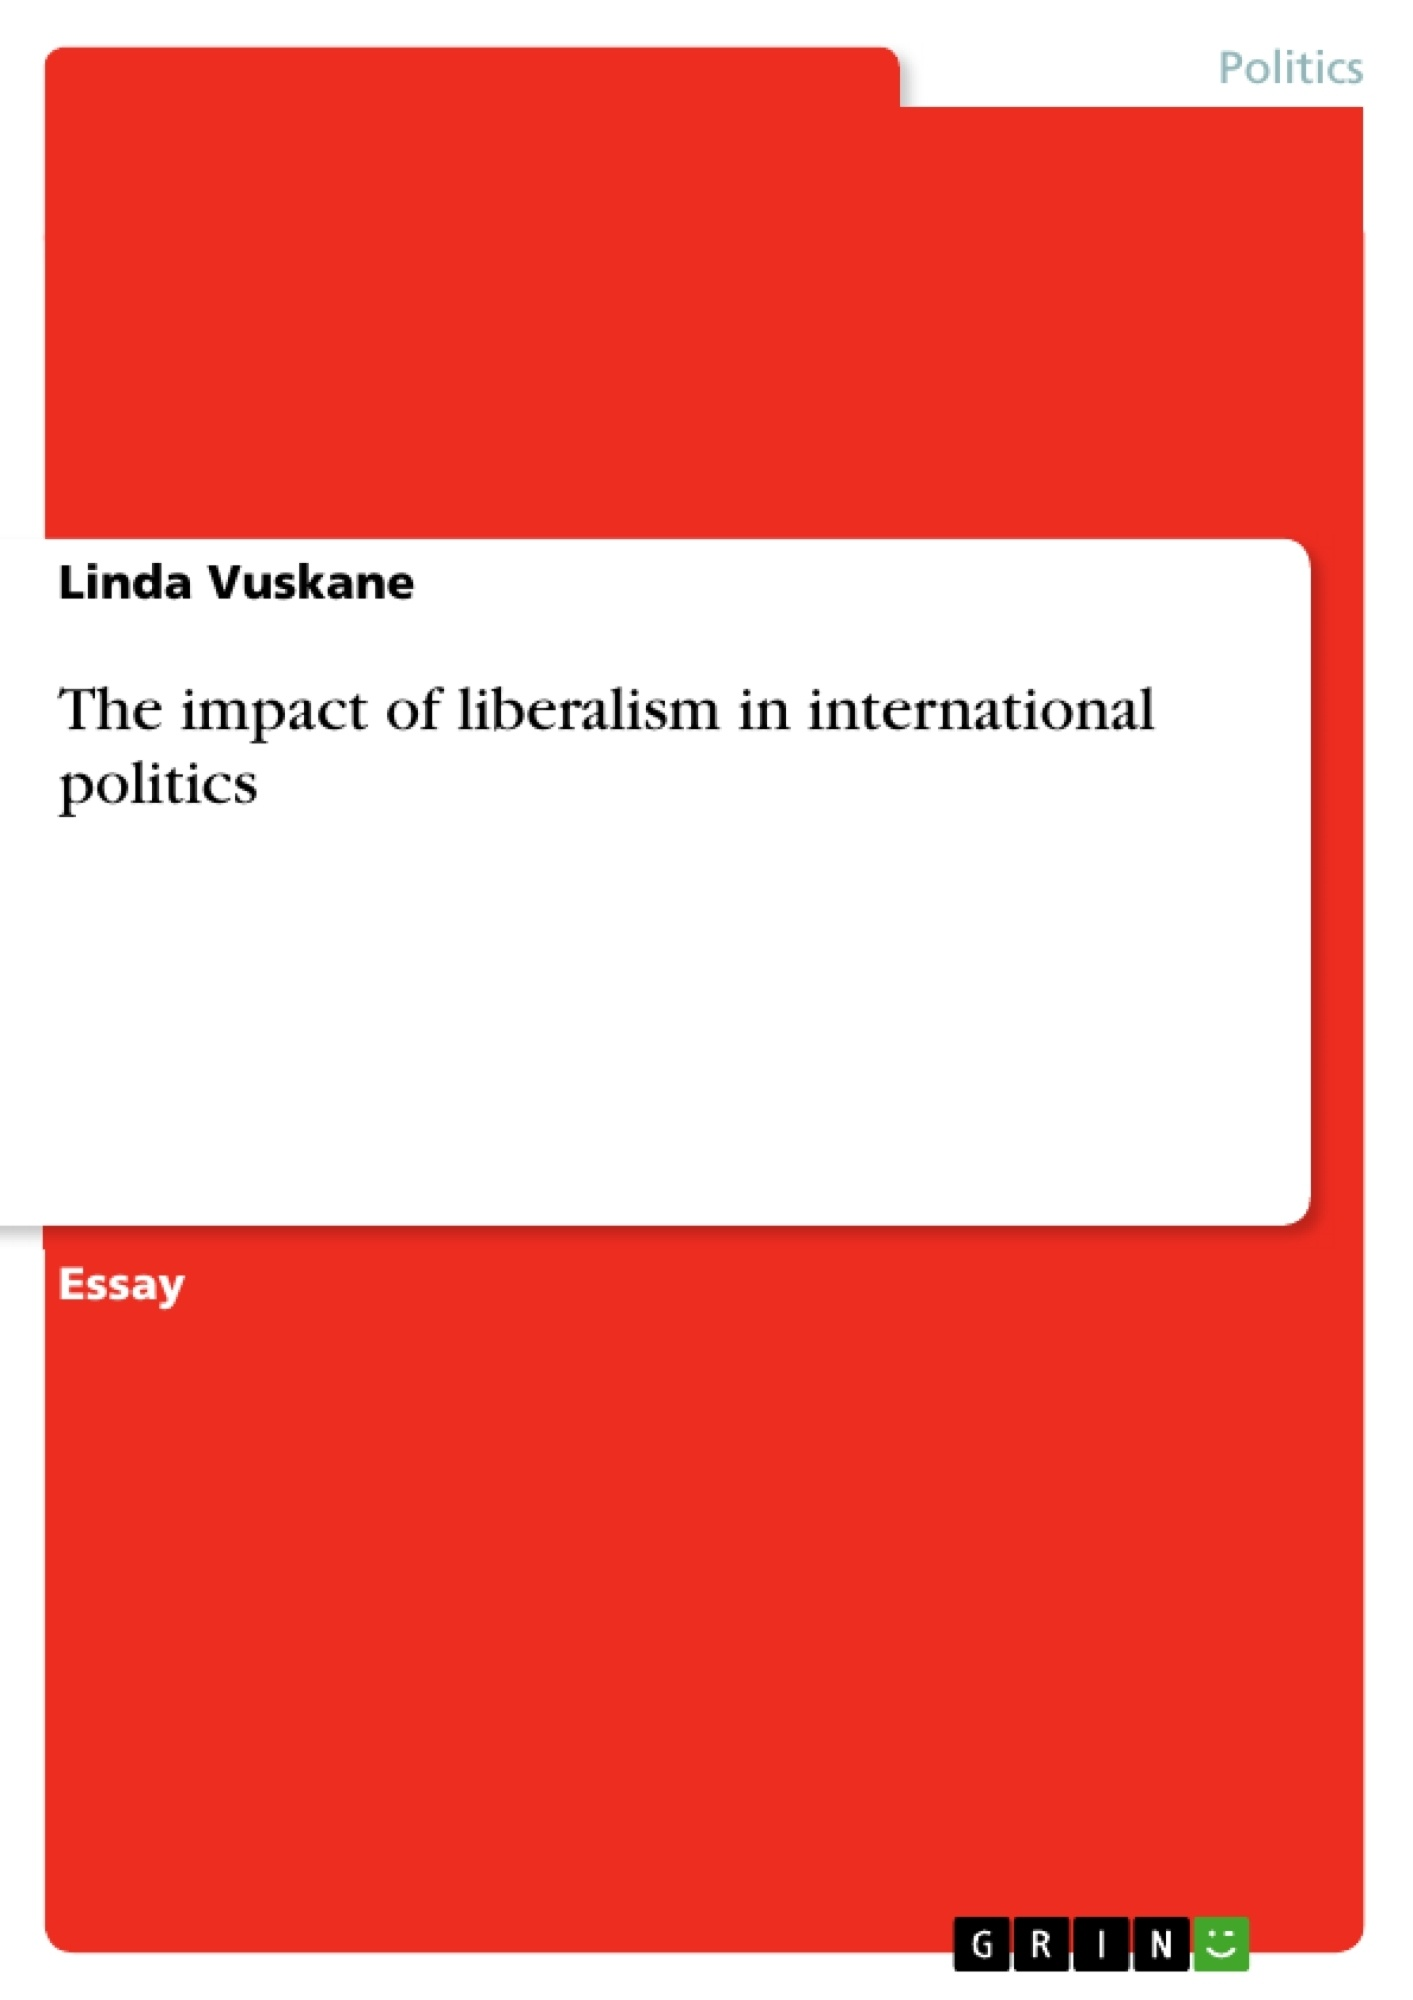 Title: The impact of liberalism in international politics